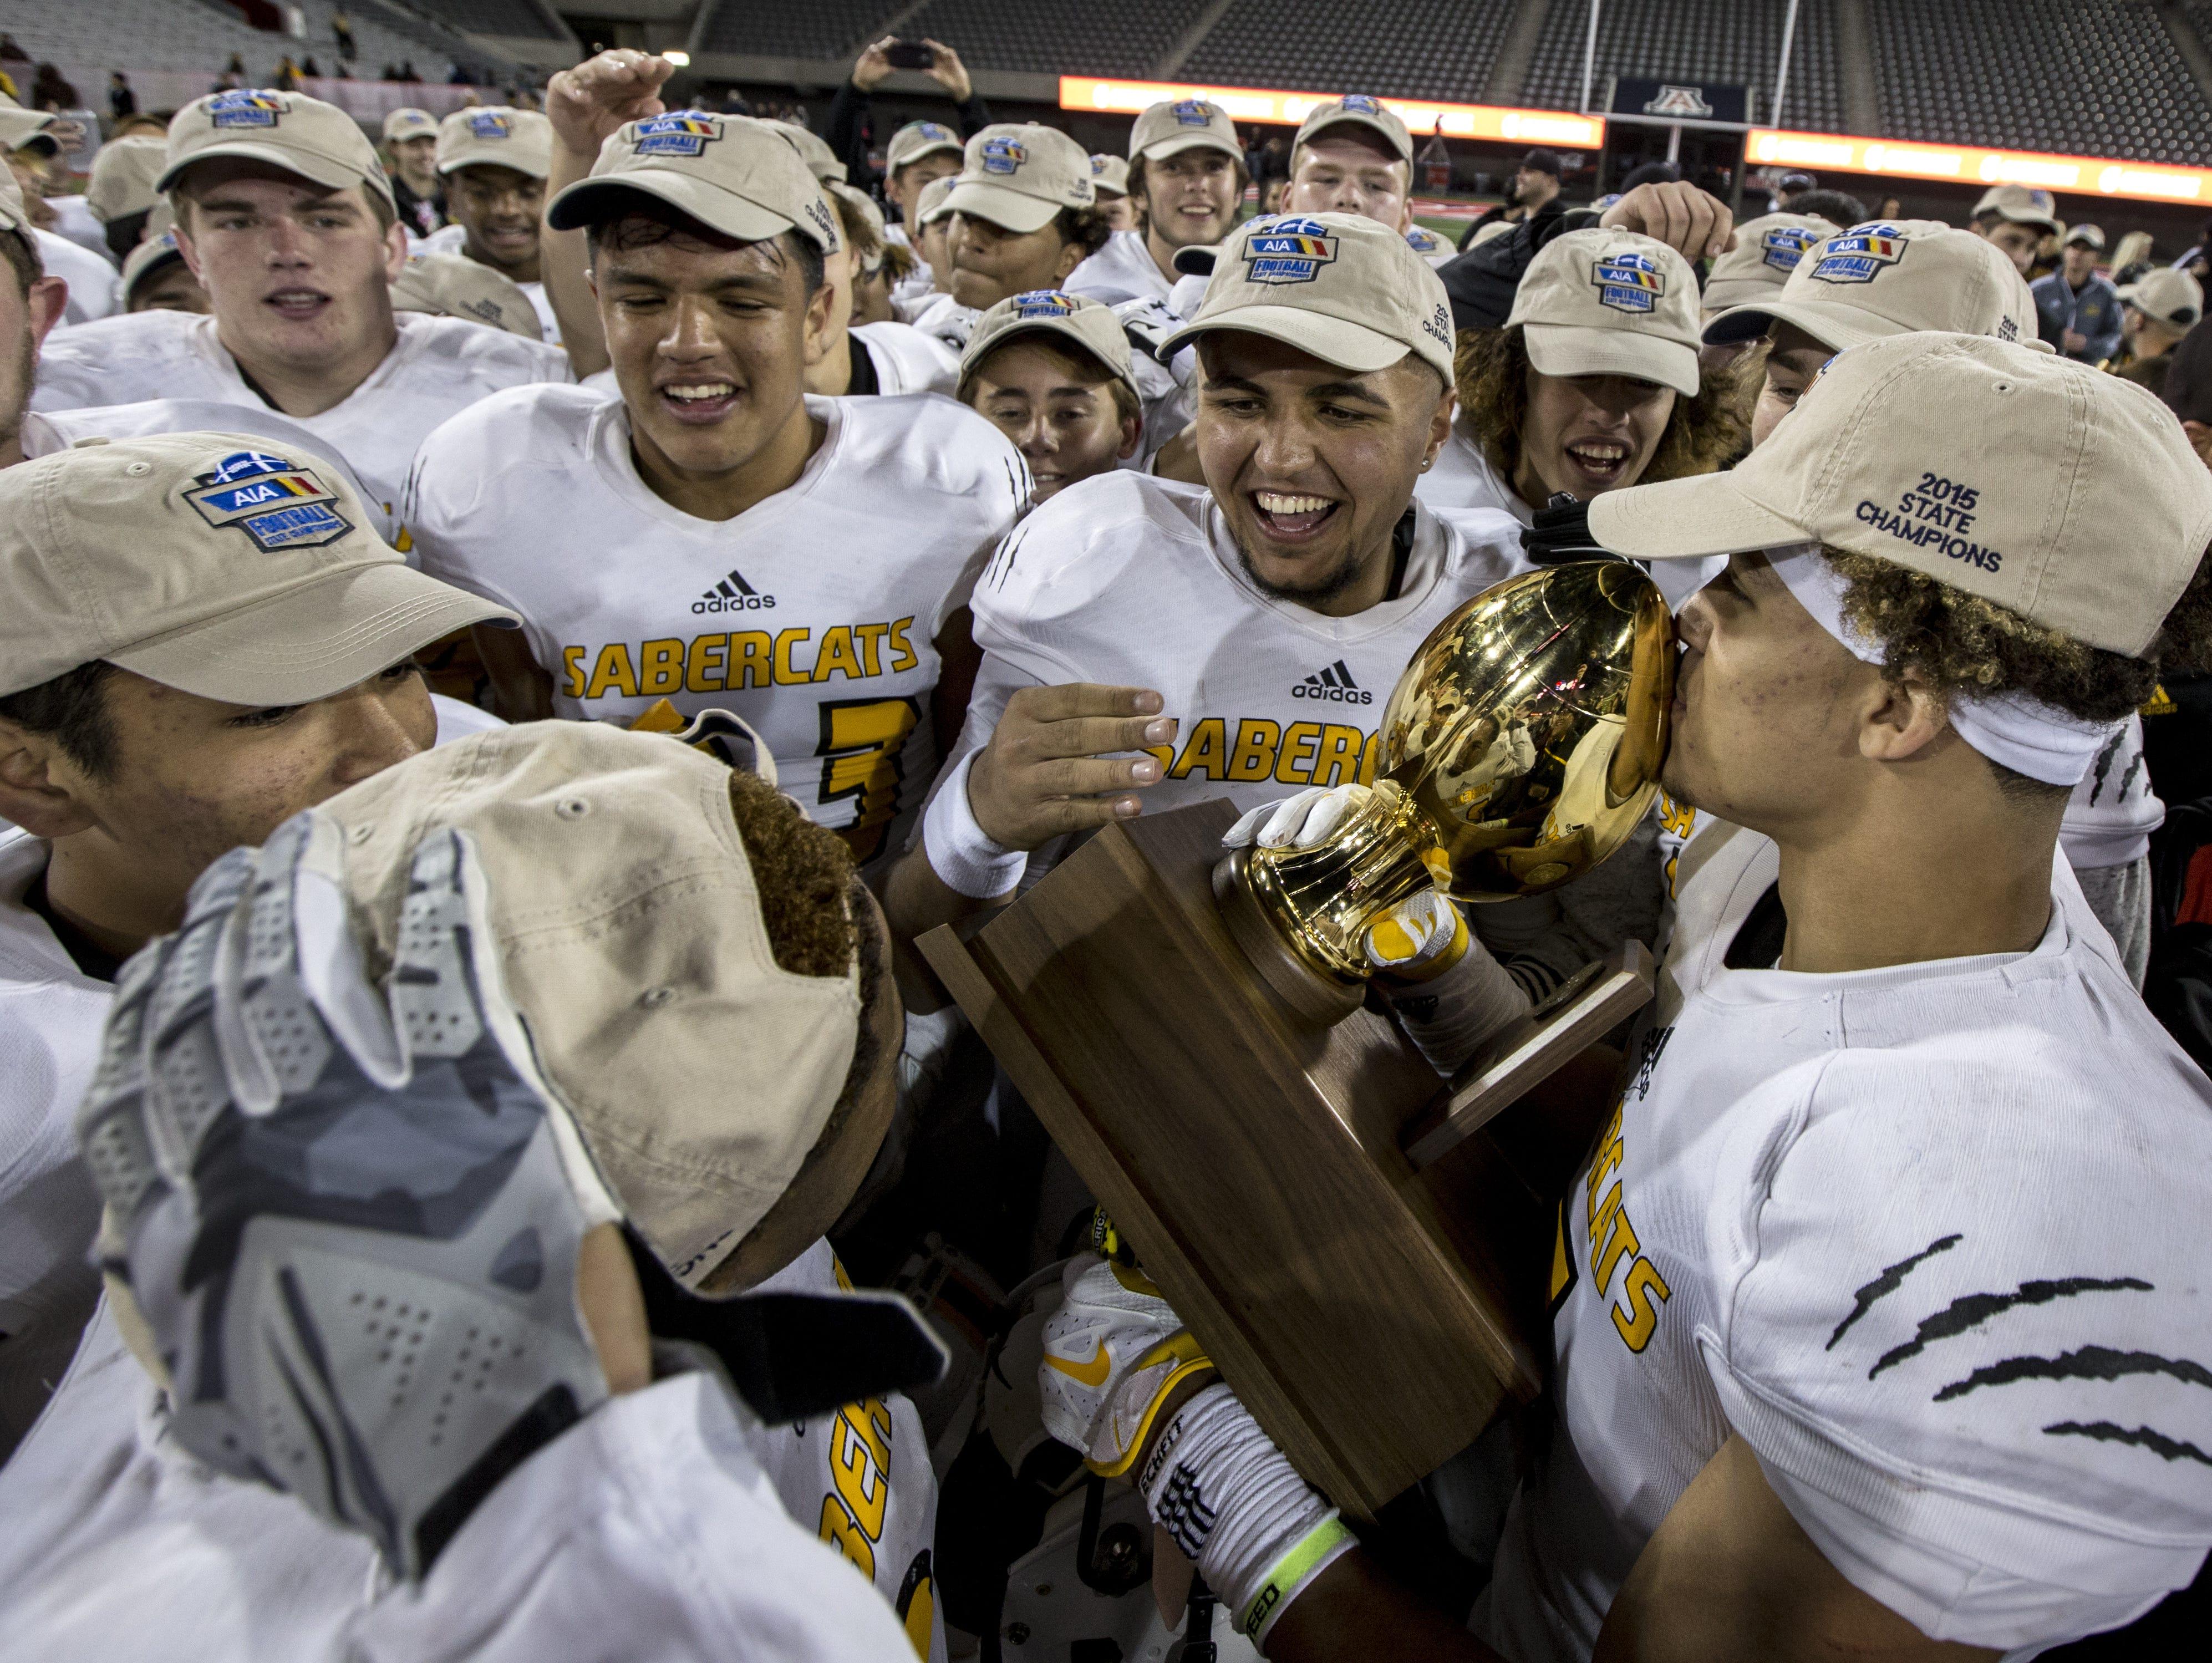 Scottsdale Saguaro celebrates after defeating Marcos de Niza for the Division II state championship on Saturday, Nov. 28, 2015 at Arizona Stadium in Tucson, Ariz. Saguaro won, 38-20.